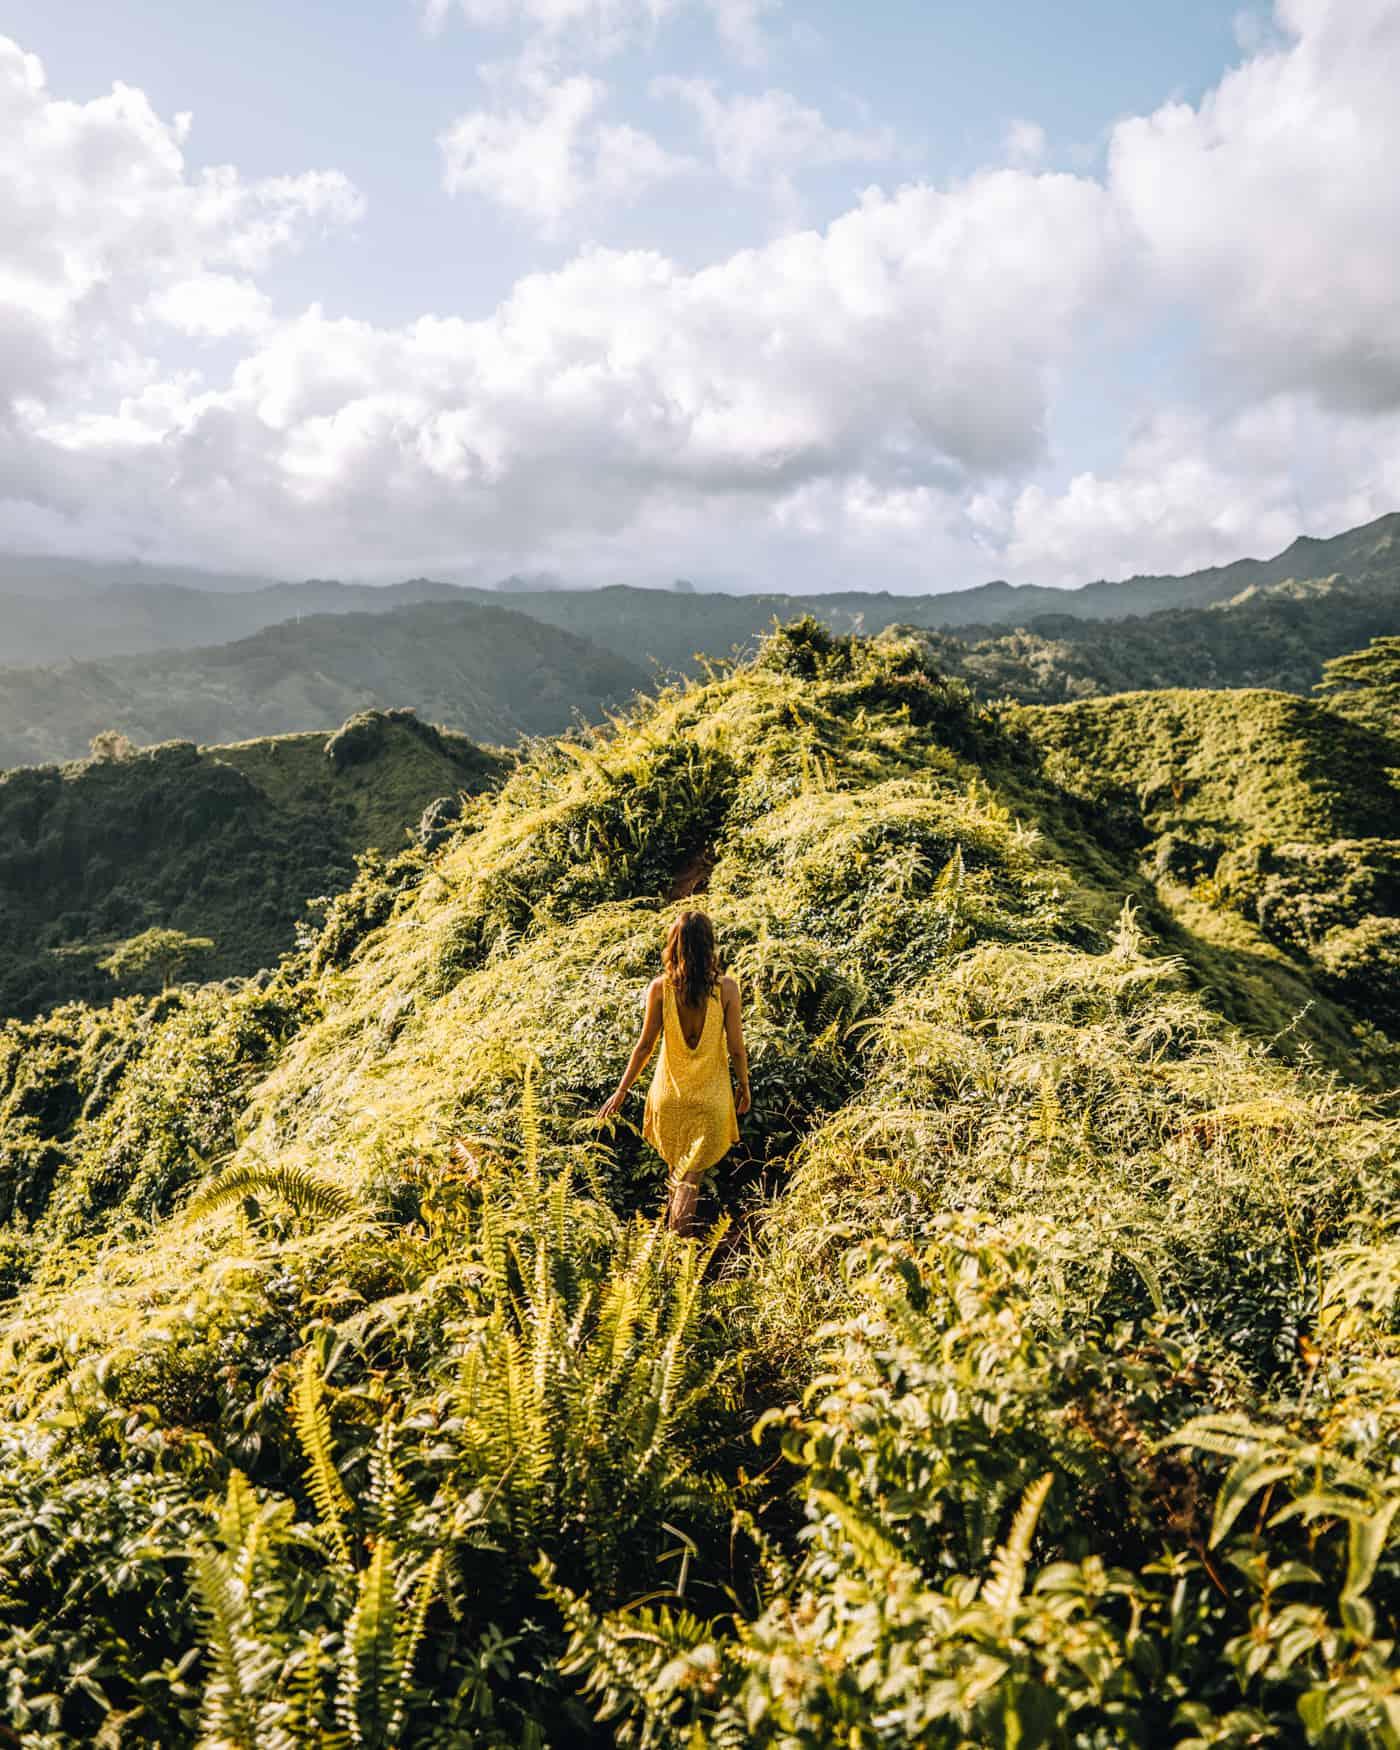 Kauai - Strände, Wandern & Ausflugsziele: Grat am Kuilao Ridge Trail